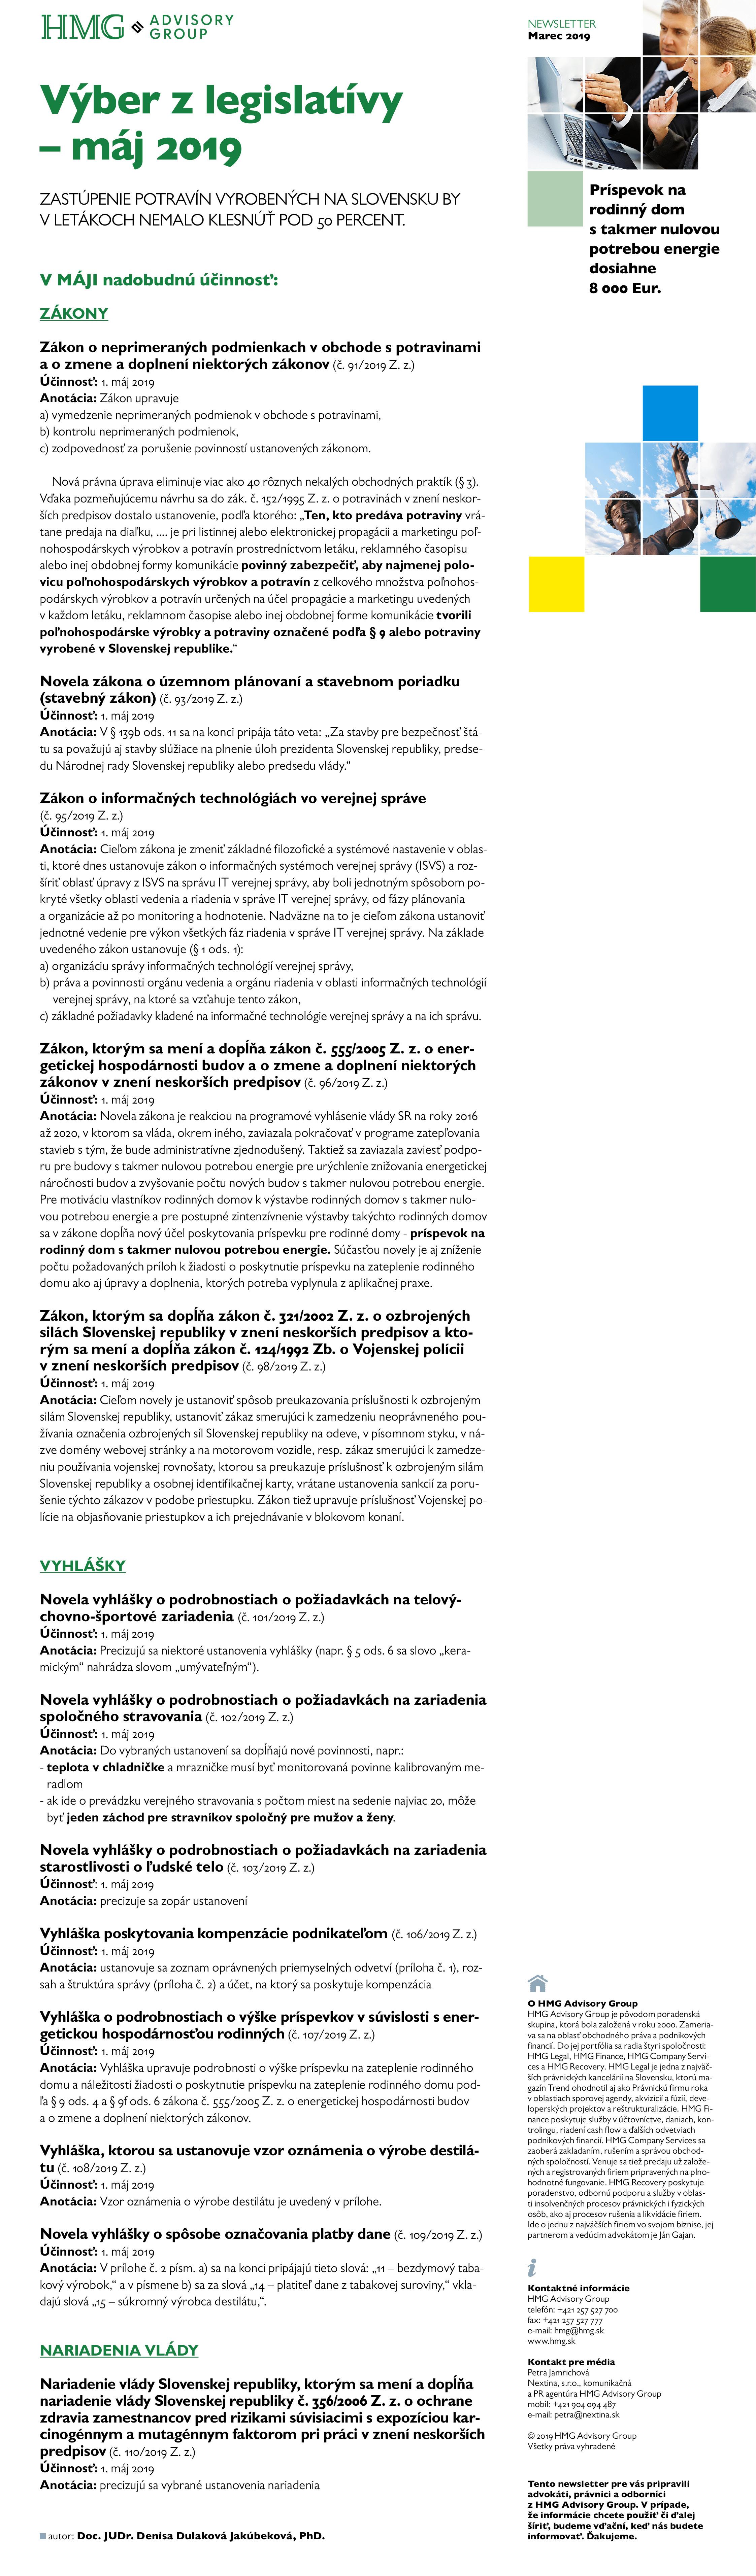 HMG_newsletter_vyber z legislativy MAJ.jpg